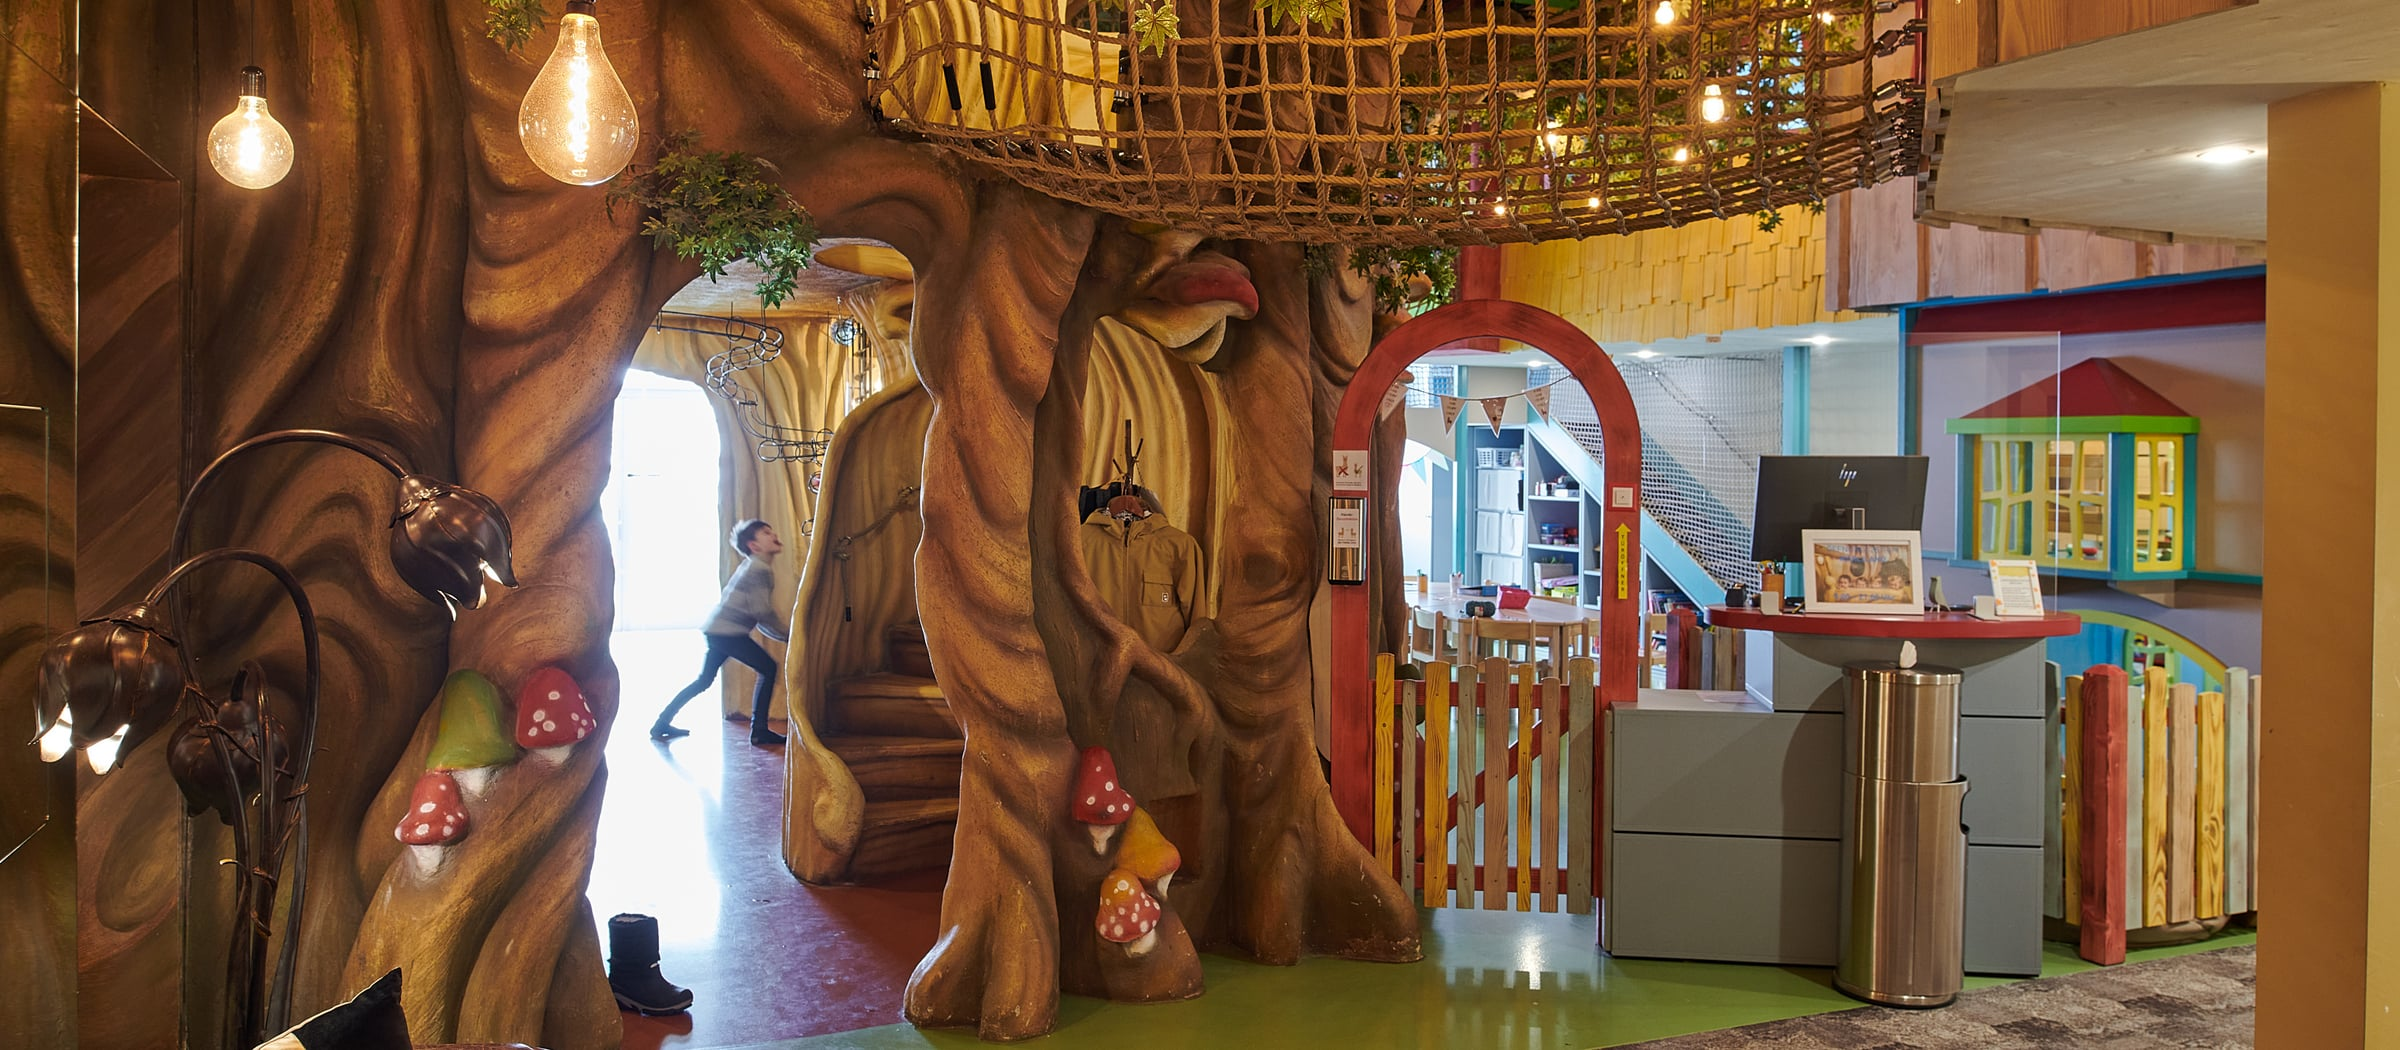 Märchenhotel Spielhalle